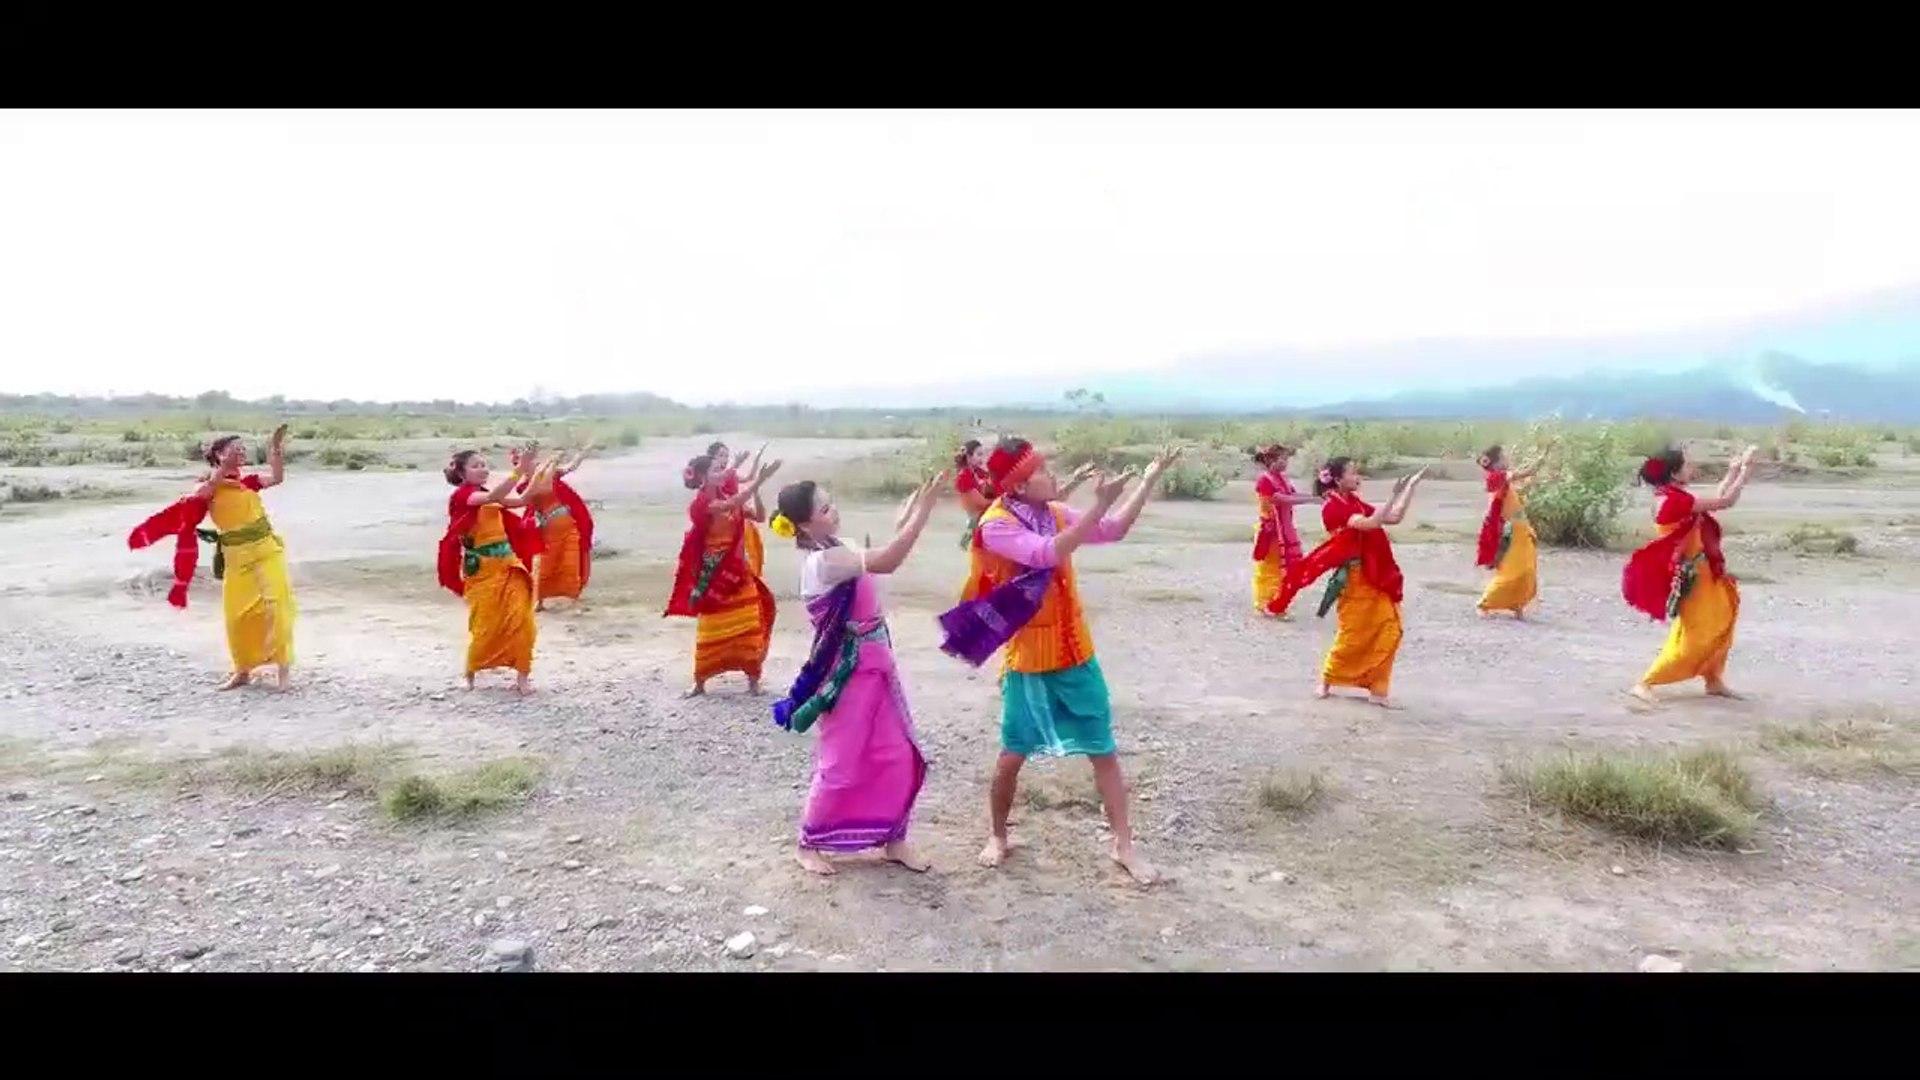 Dwmwilulu new bodo bwisagu music video song by Rubeen boro_2019 ft. Shimang & Mithinga (Official